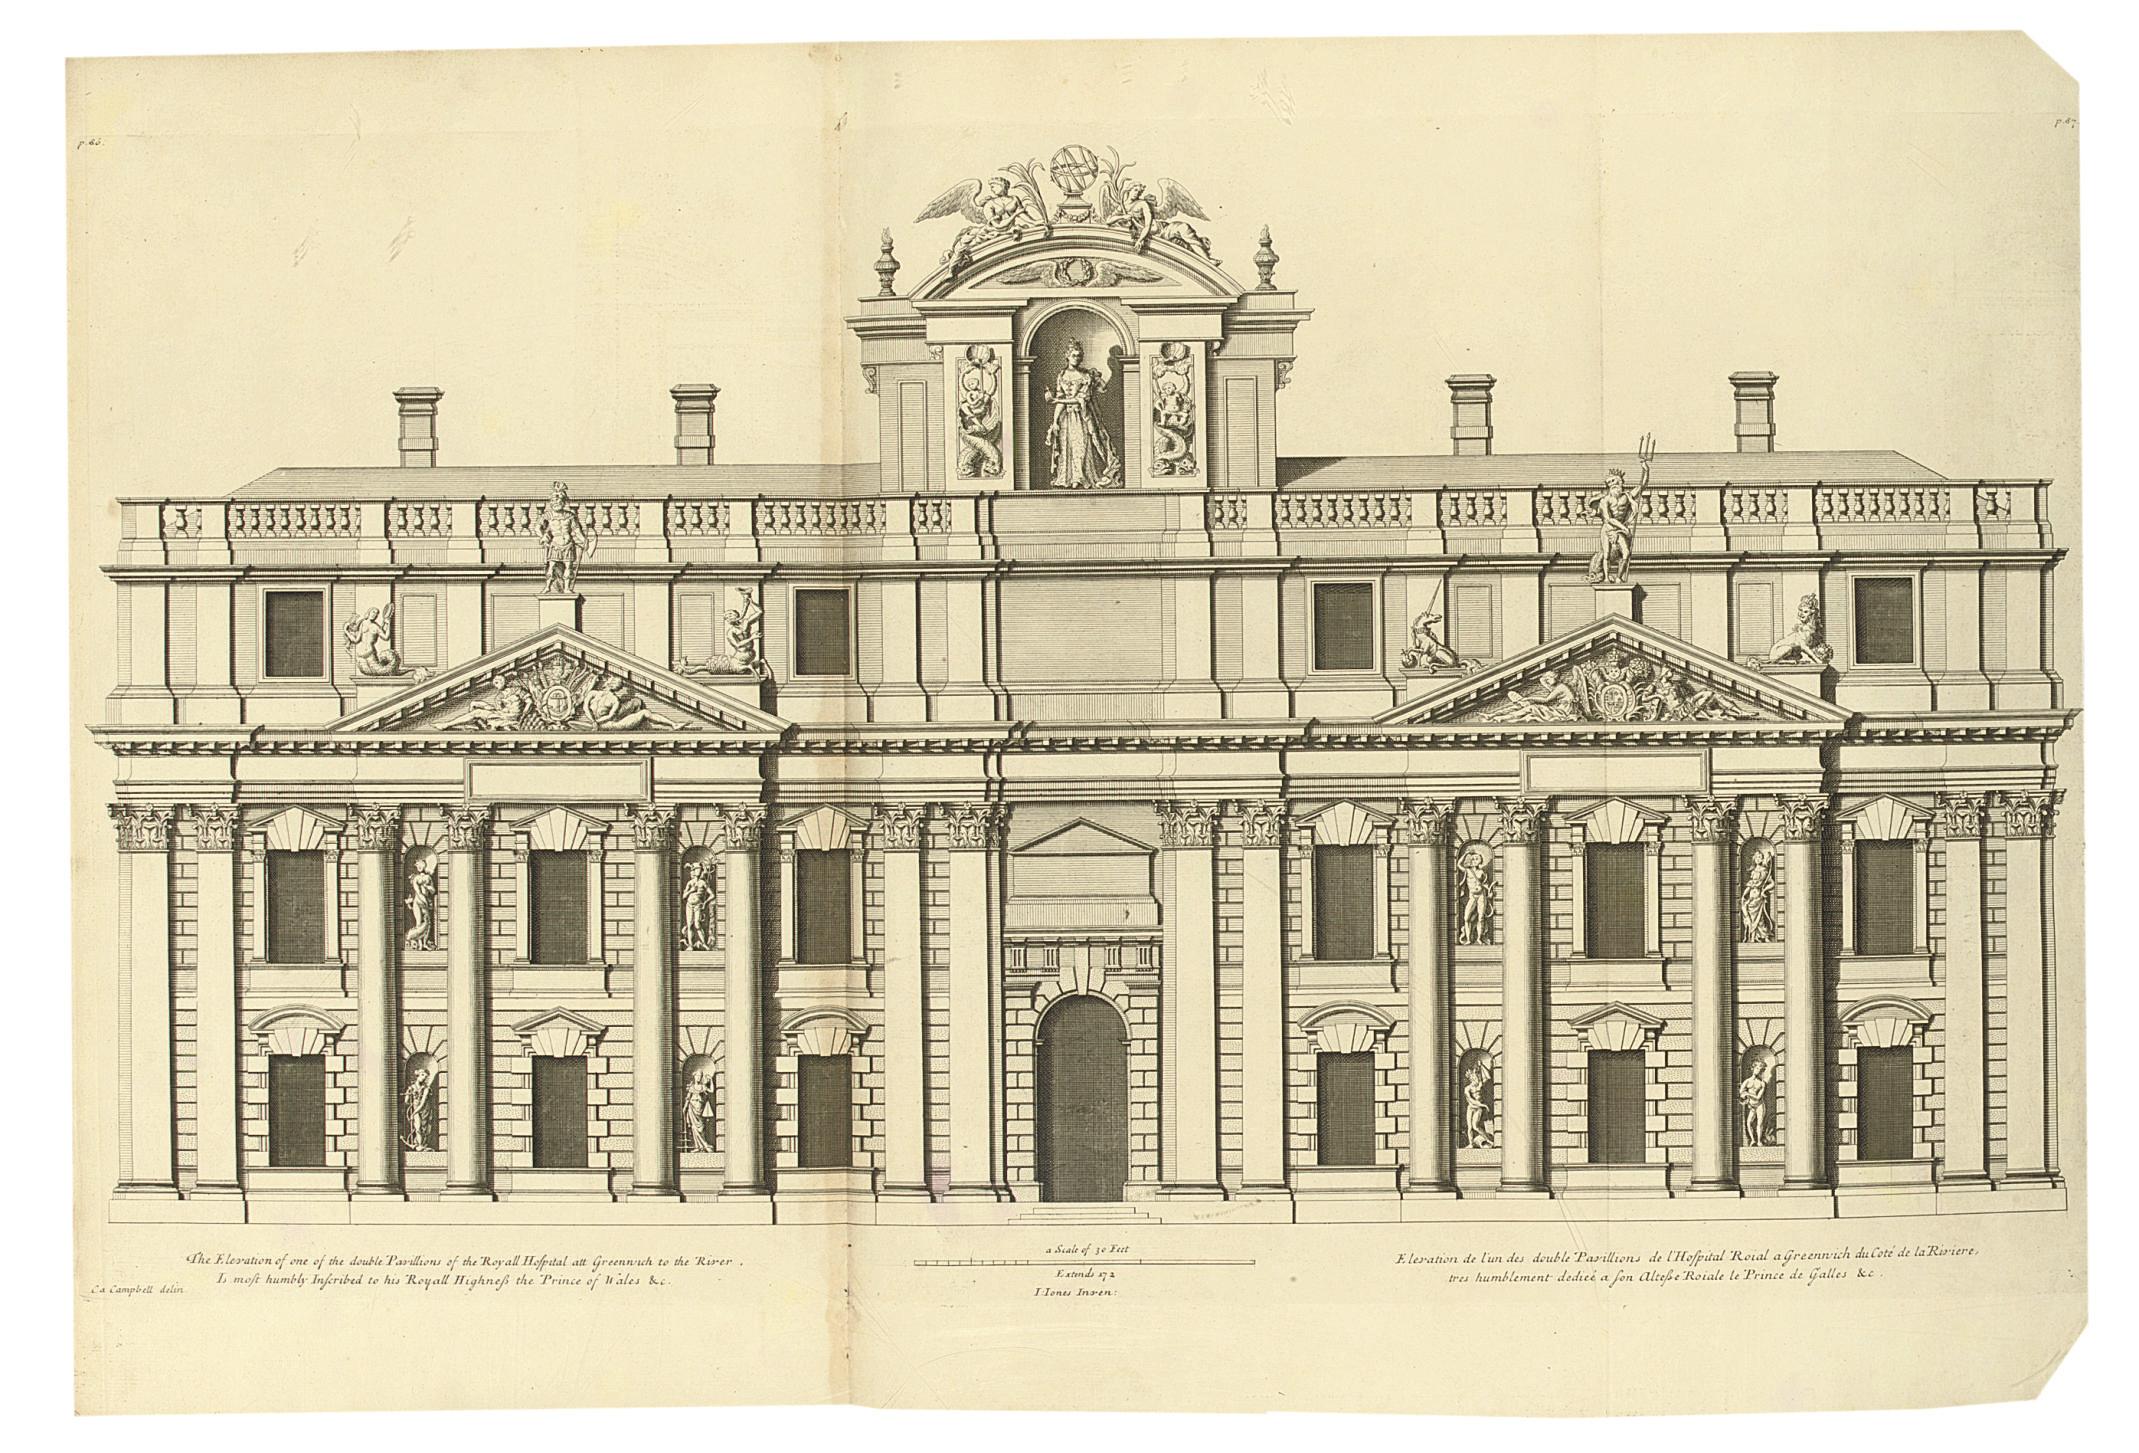 CAMPBELL, Colin (fl. 1715-1729